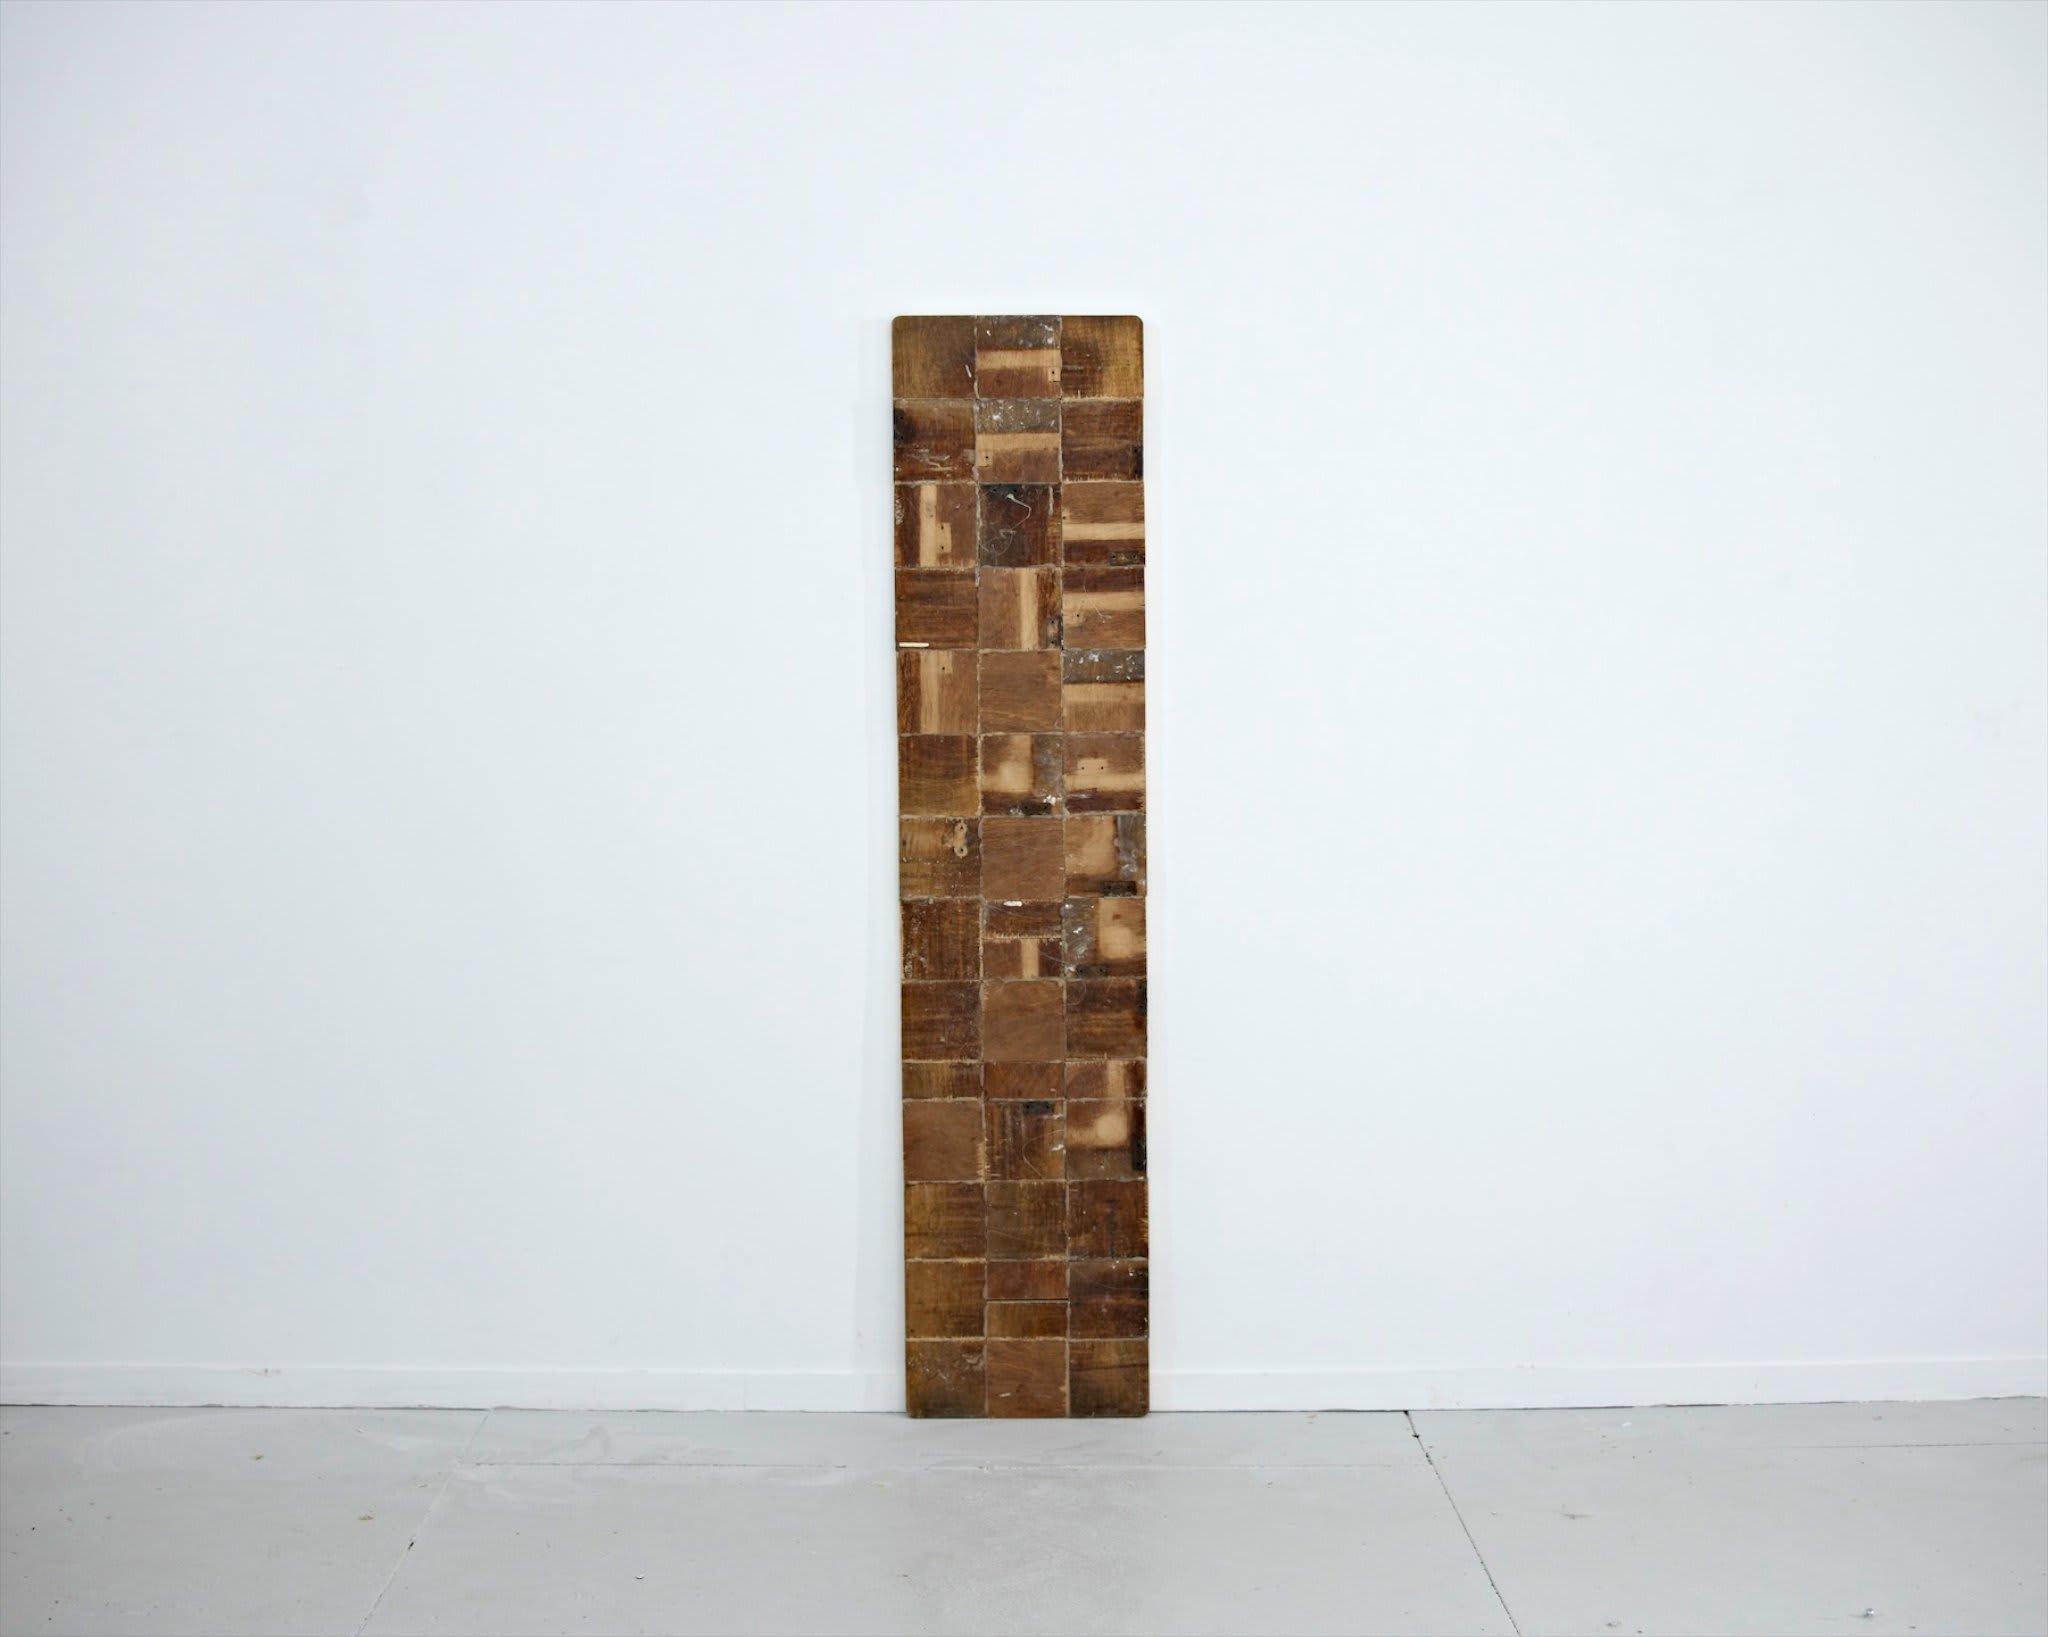 <span class=&#34;link fancybox-details-link&#34;><a href=&#34;/artists/16-paul-merrick/works/8109/&#34;>View Detail Page</a></span><div class=&#34;artist&#34;><strong>Paul Merrick</strong></div> <div class=&#34;title&#34;><em>Untitled (After John)</em>, 2013</div> <div class=&#34;medium&#34;>Melamine, glue</div> <div class=&#34;dimensions&#34;>32 x 144.5 cm<br />12 5/8 x 56 7/8 in</div><div class=&#34;copyright_line&#34;>Copyright The Artist</div>